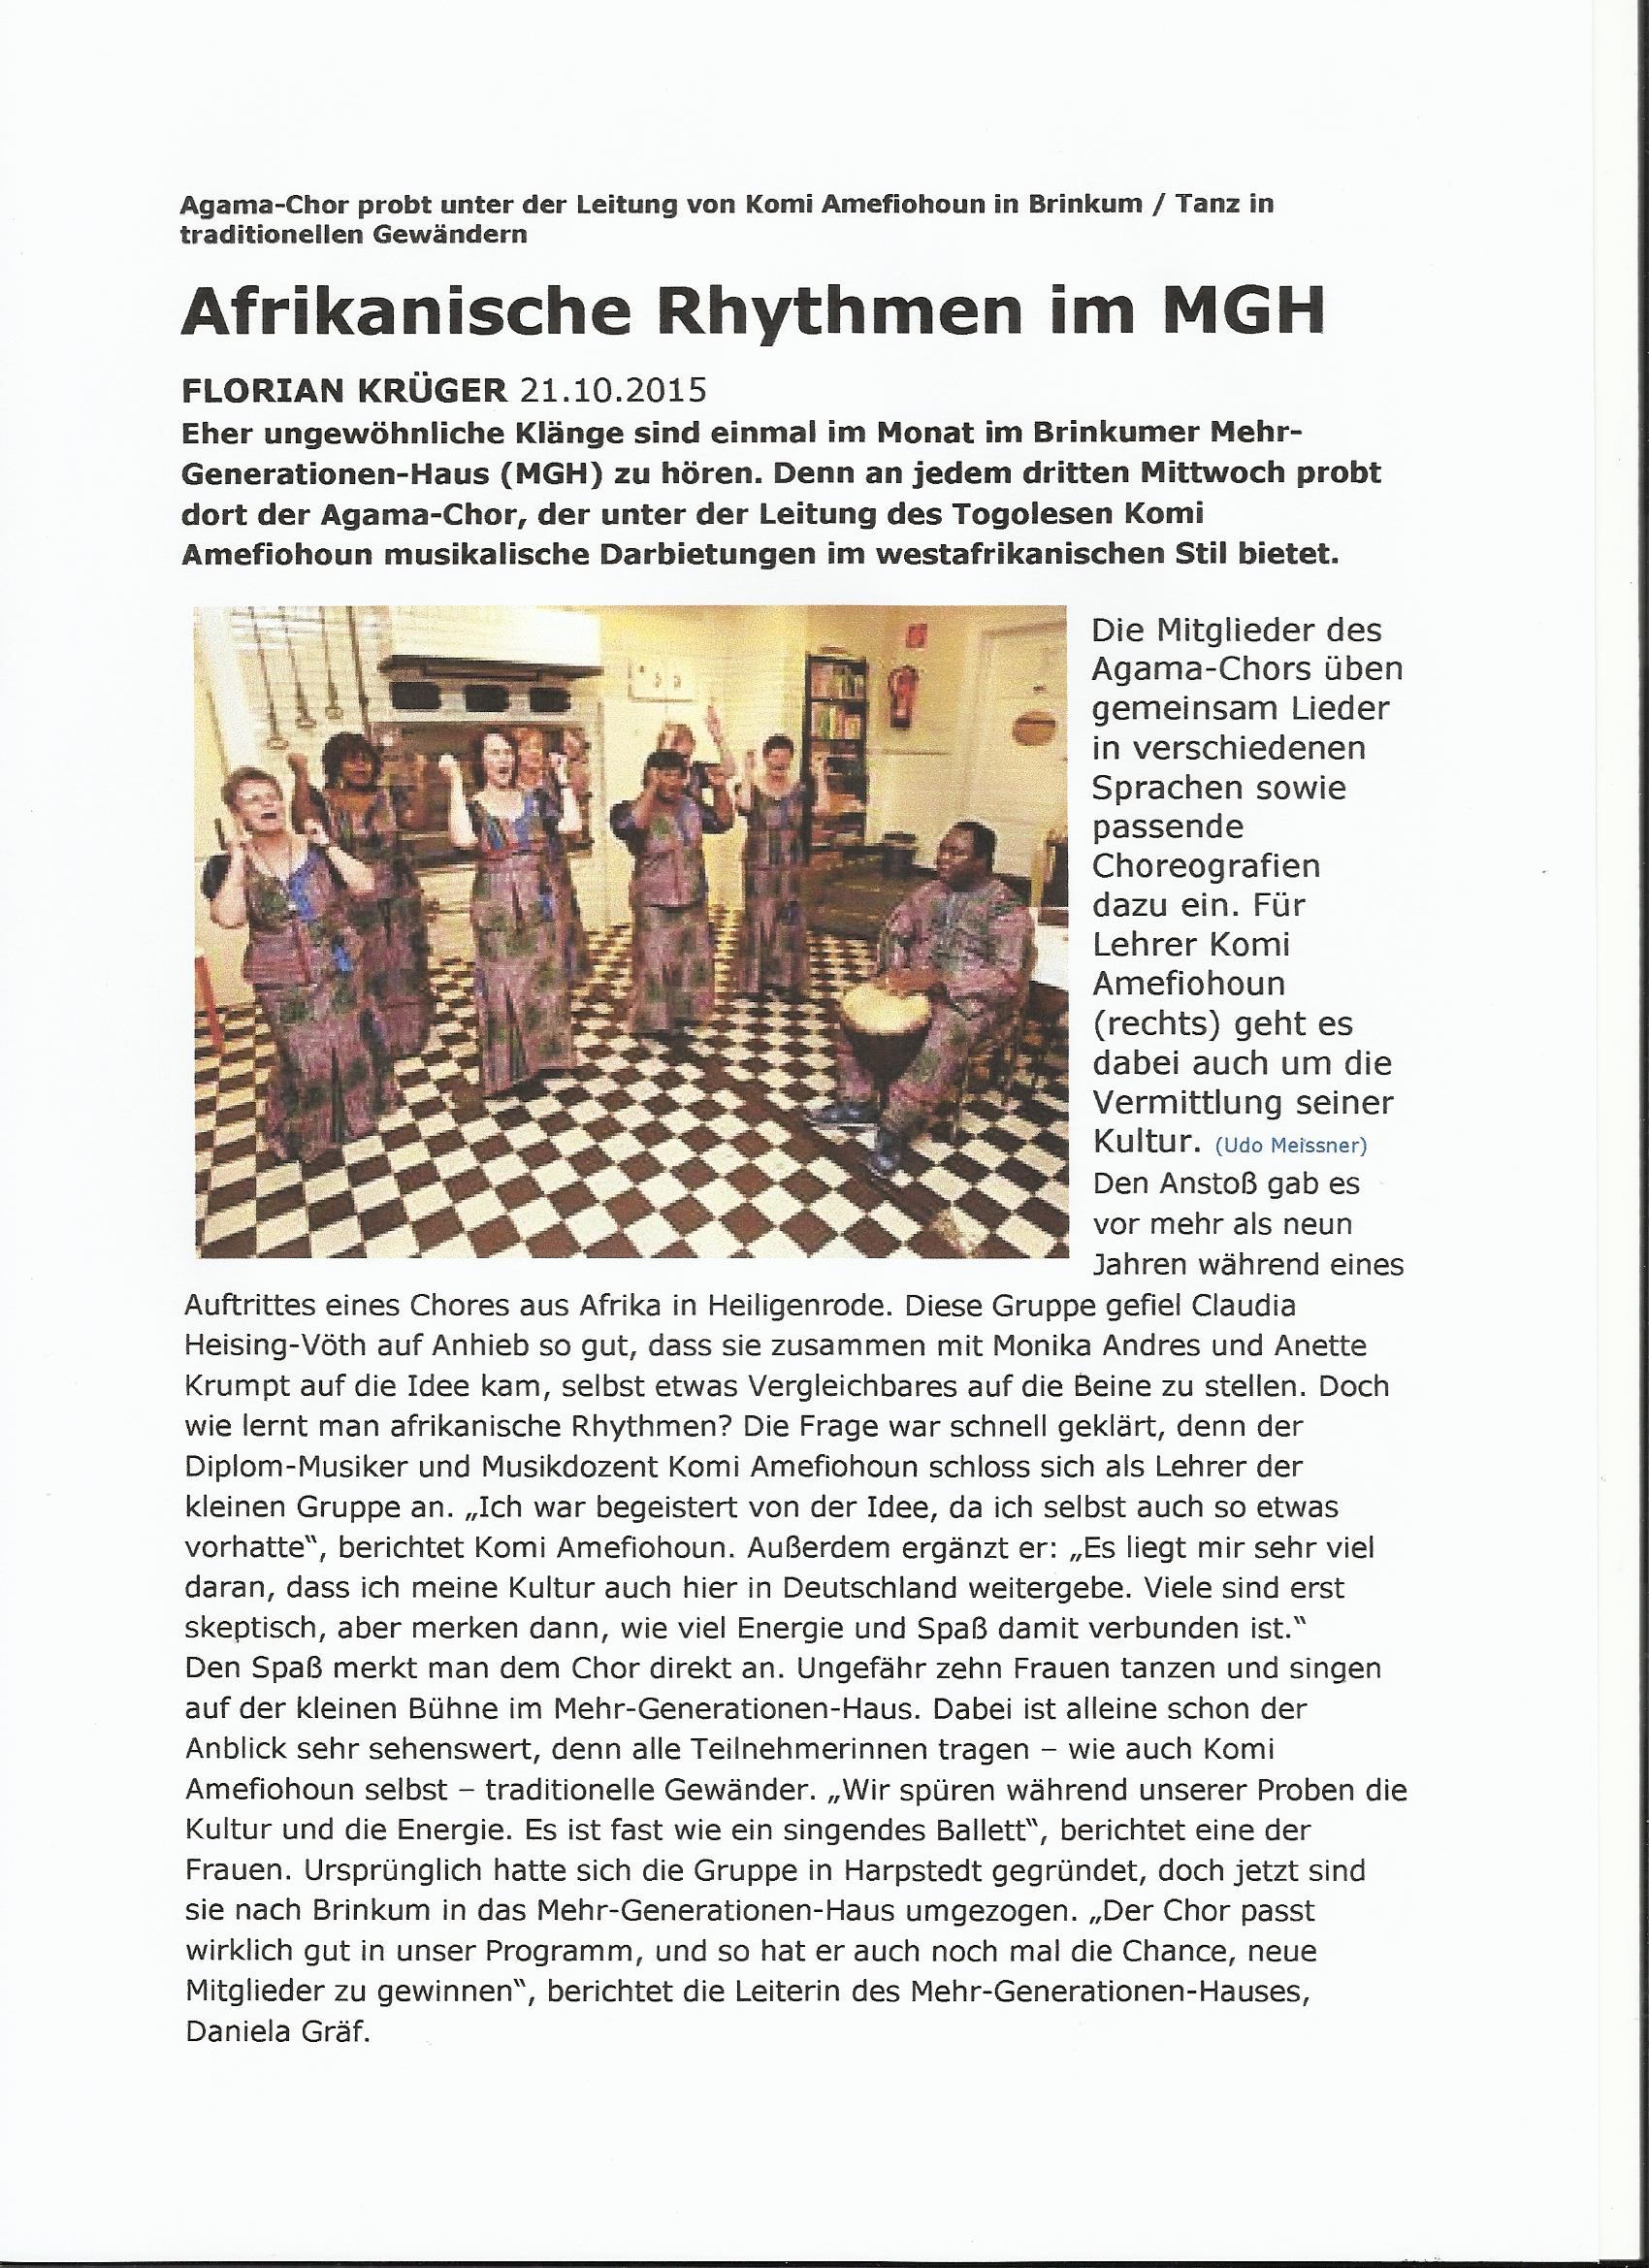 Afrikanische Rhythmen im MGH Brinkum Oktober 2015